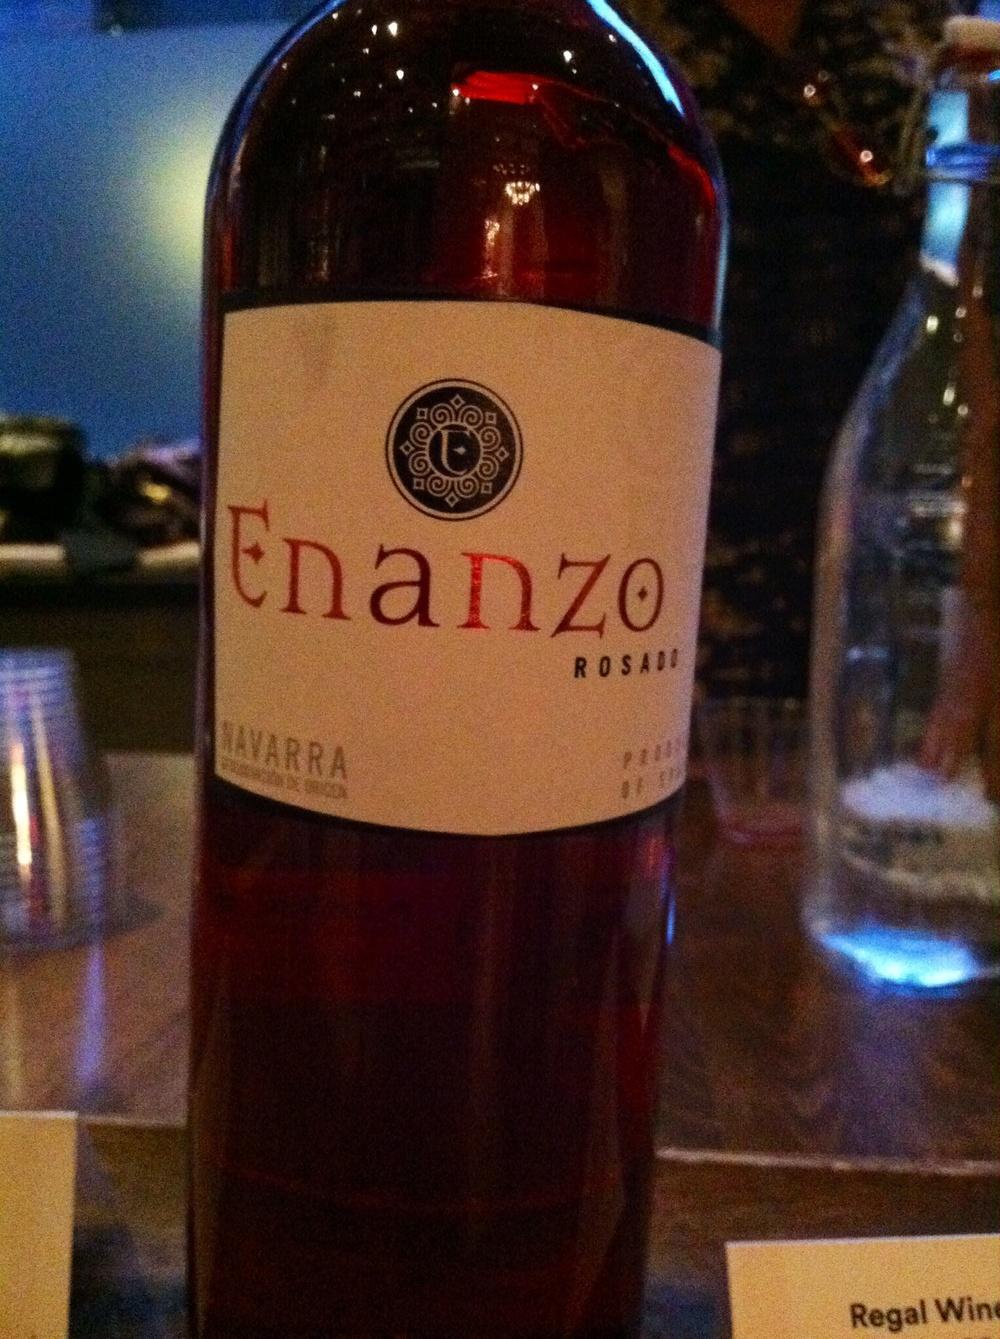 Enanzo, Rosado, Garnacha, Spain, 2013. Photo by Shana Sokol, Shana Speaks Wine